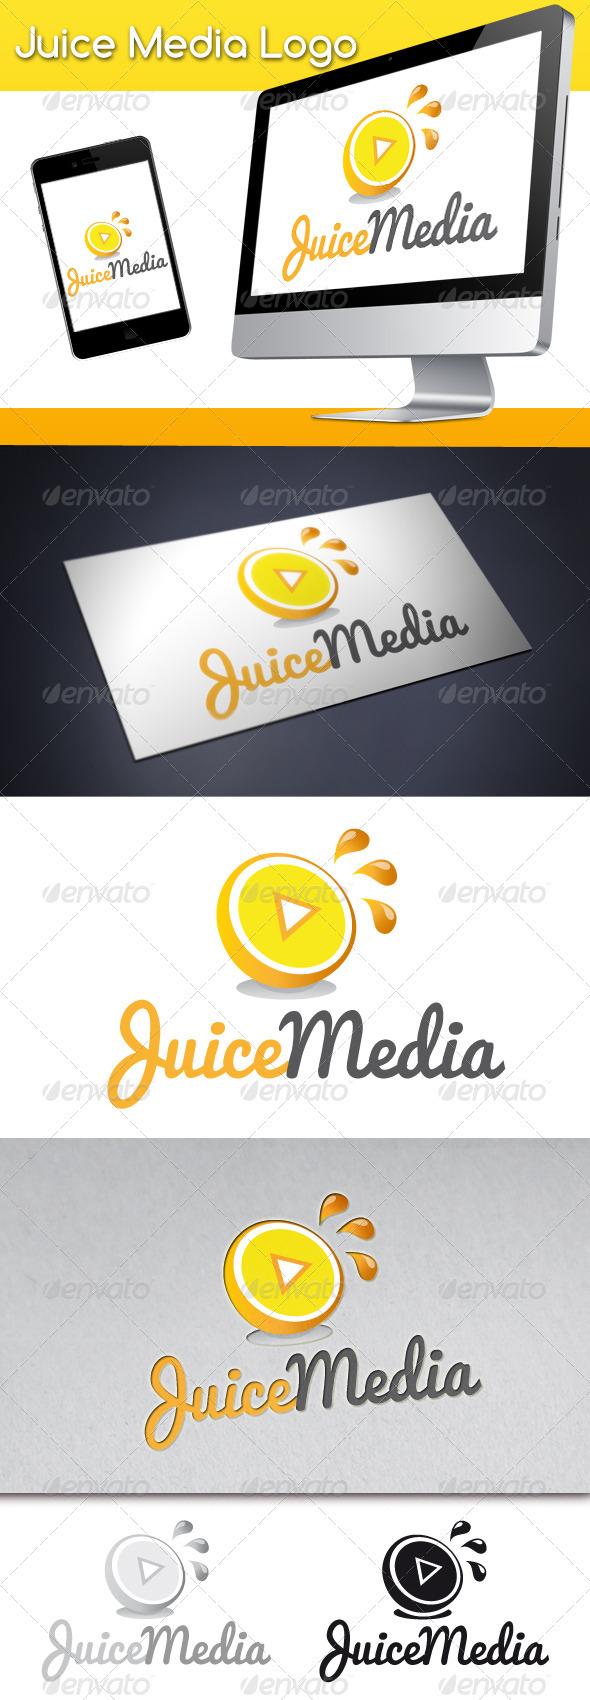 GraphicRiver Juice Media Logo 2882820